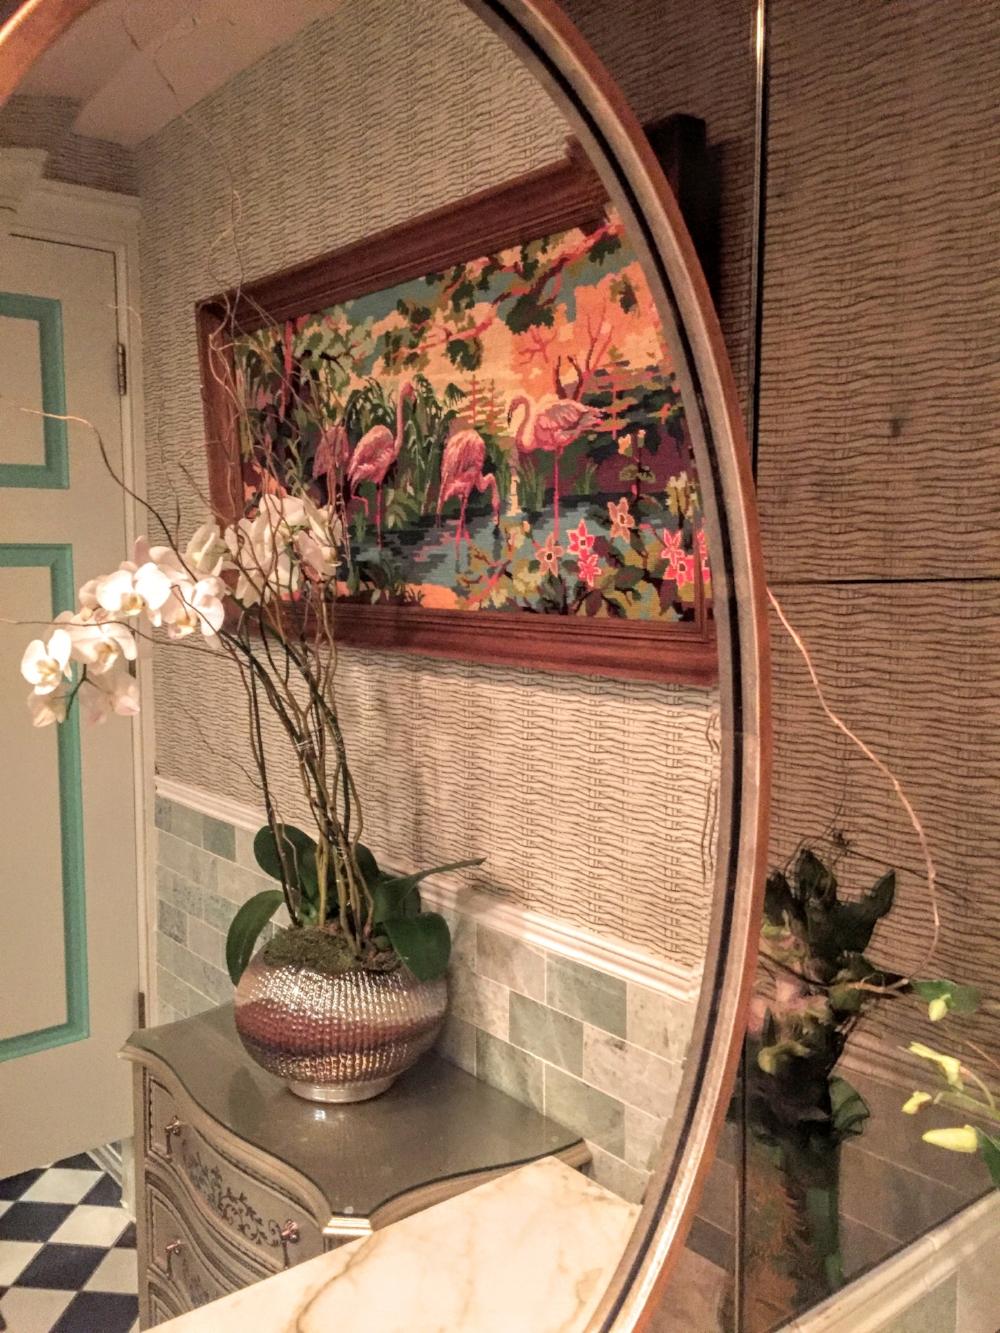 Downstairs bathroom detail